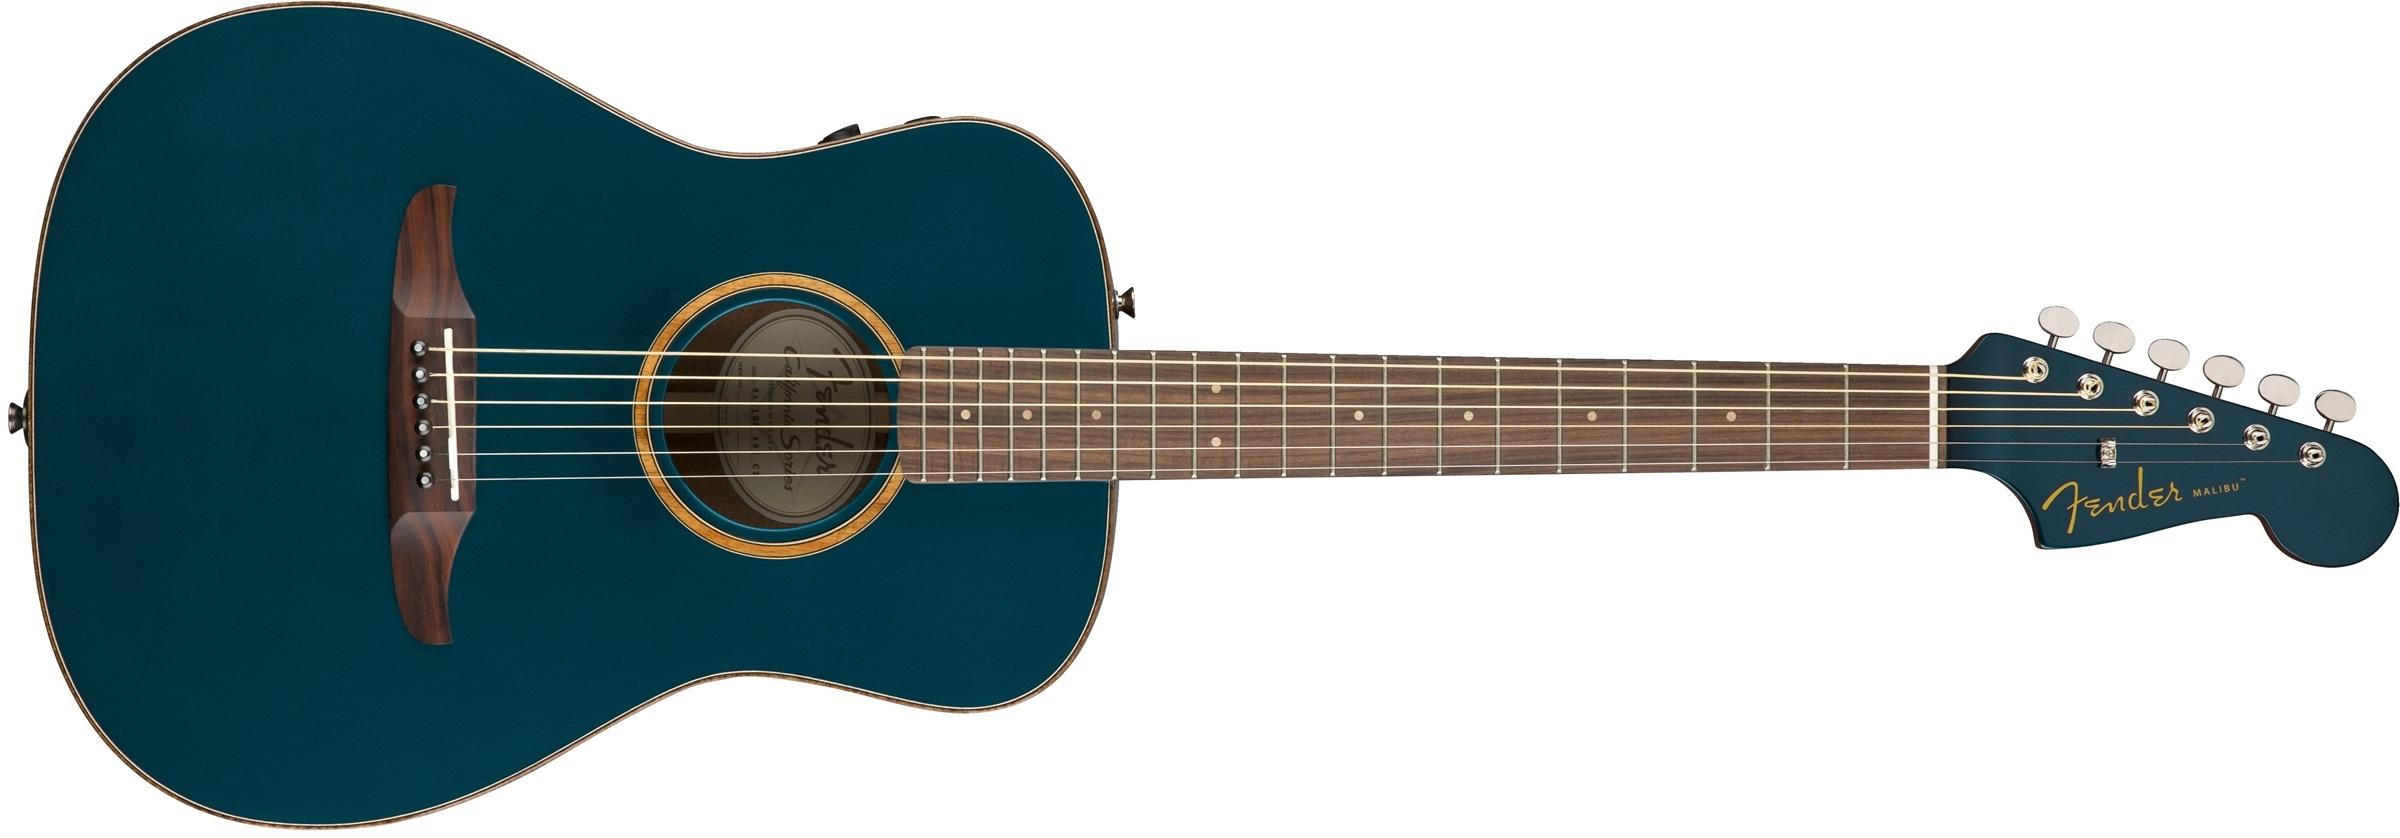 Fender Malibu Classic CST